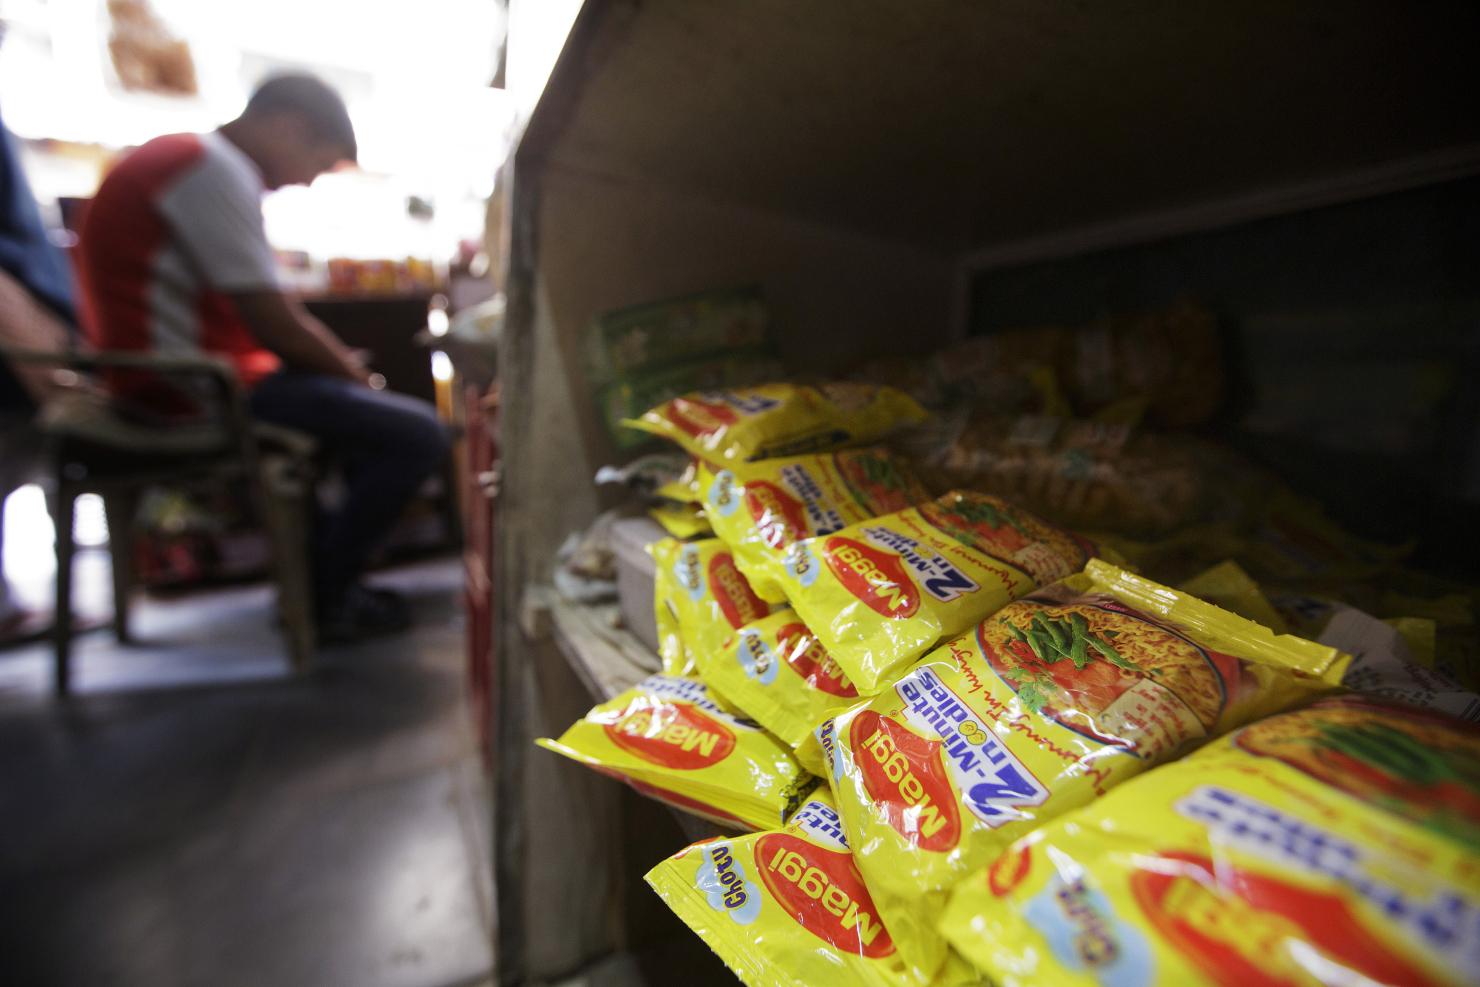 Maggi Noodles At Stores As Nestle SA's Crisis Deepens